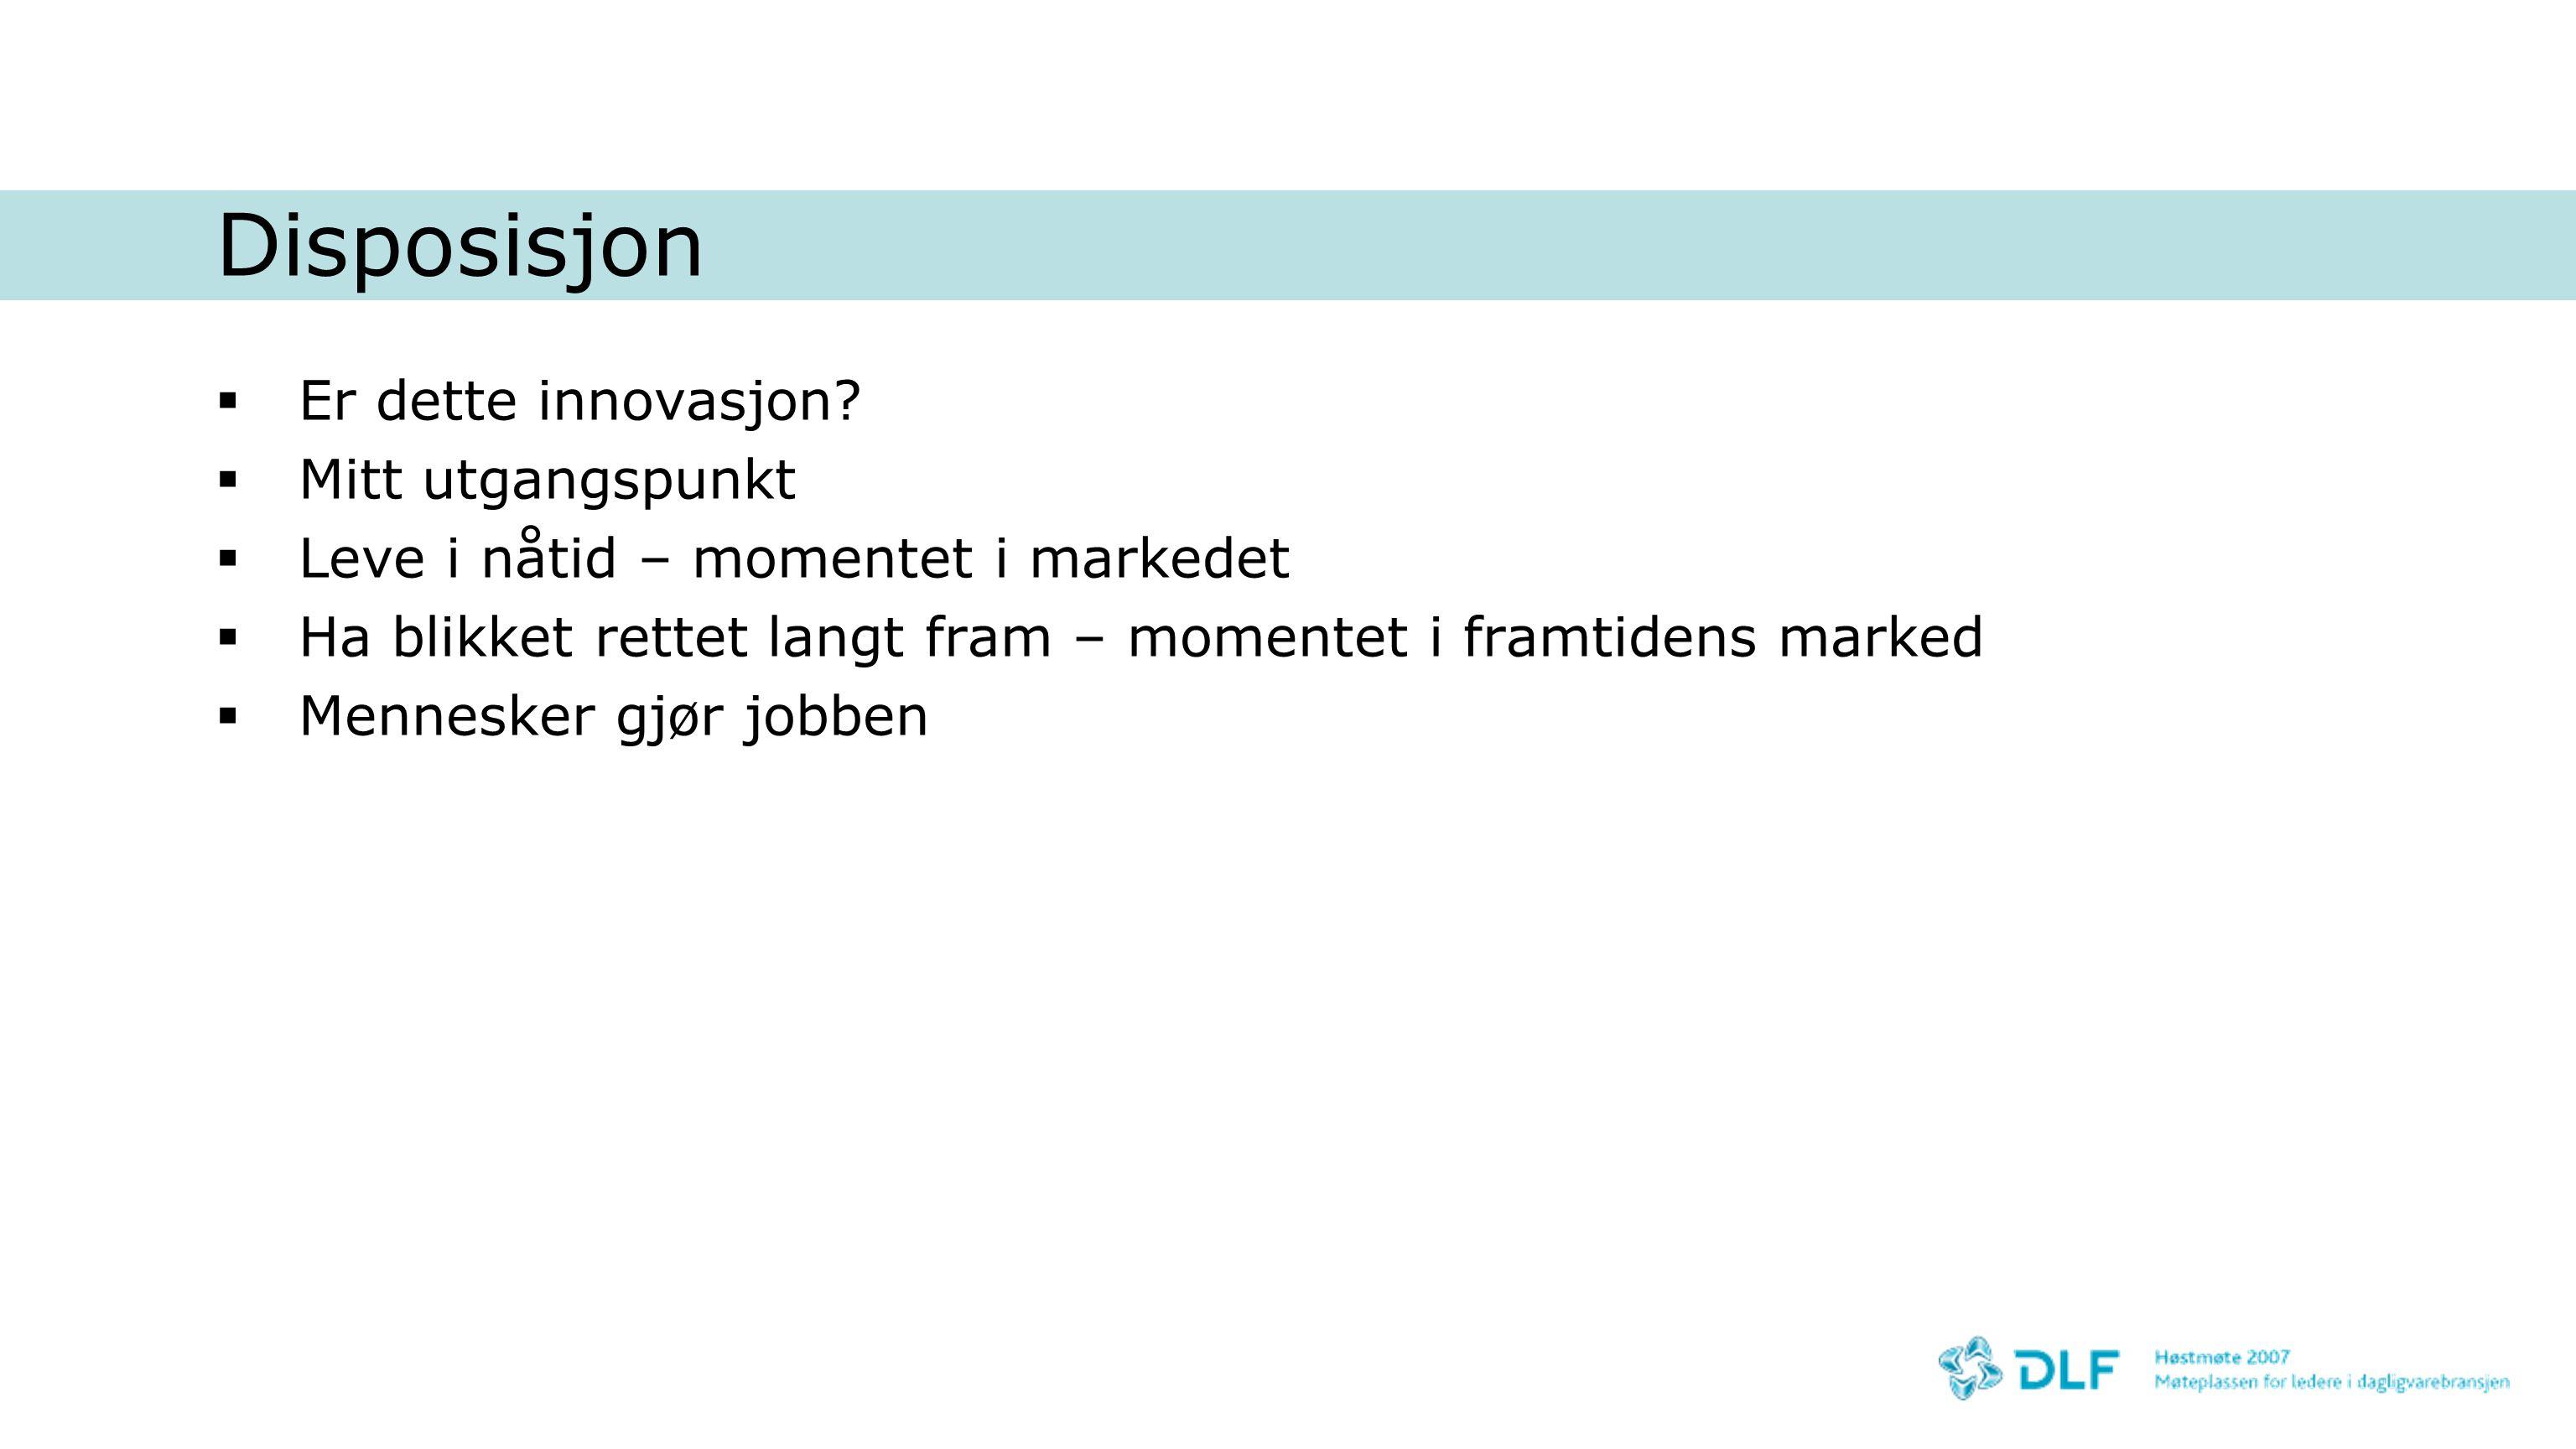 Bindersen – en norsk oppfinnelse.Johan Vaaler fikk patent på bindersen i tyskland i 1899.